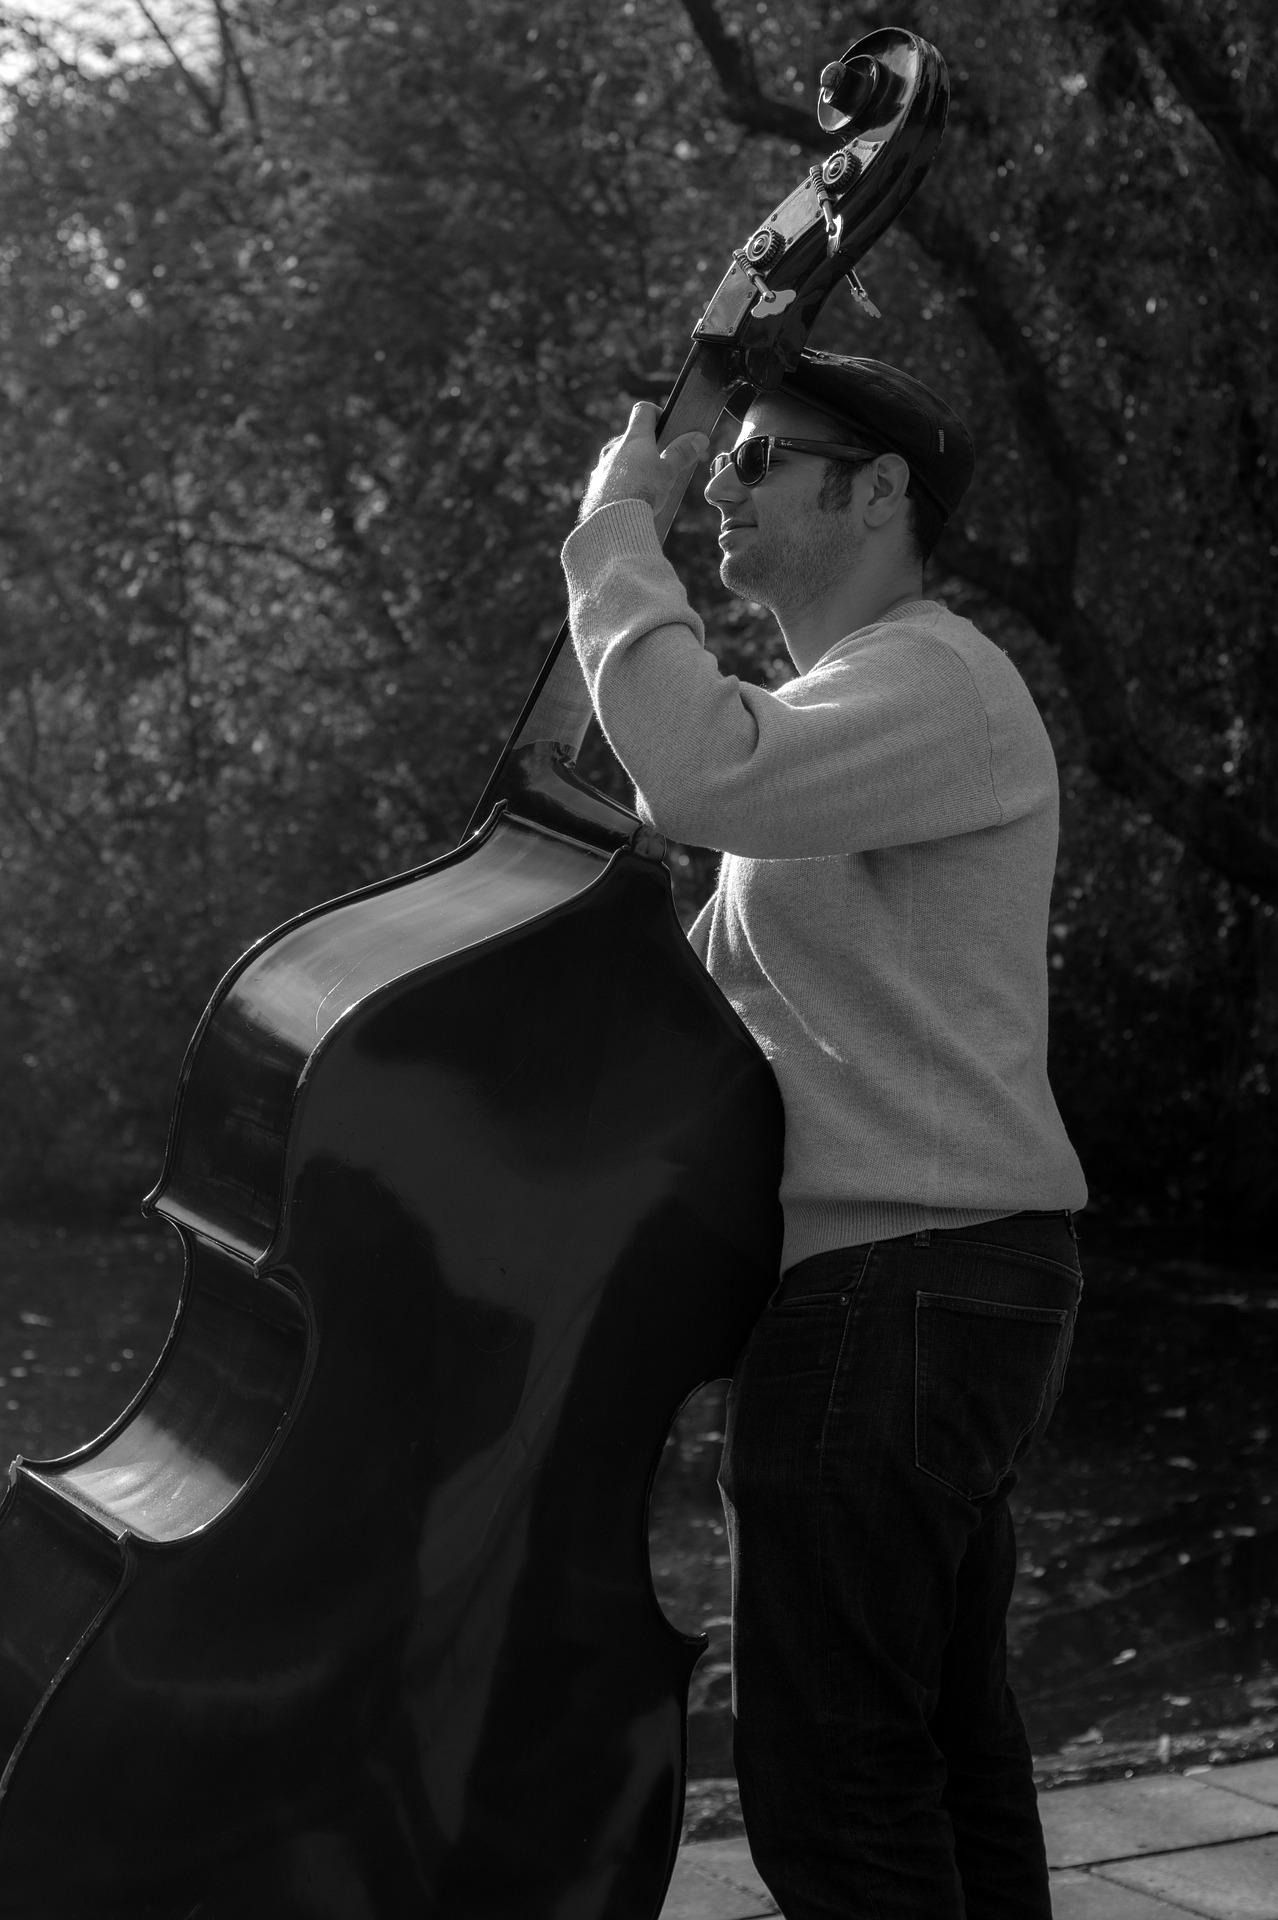 Bass player photo